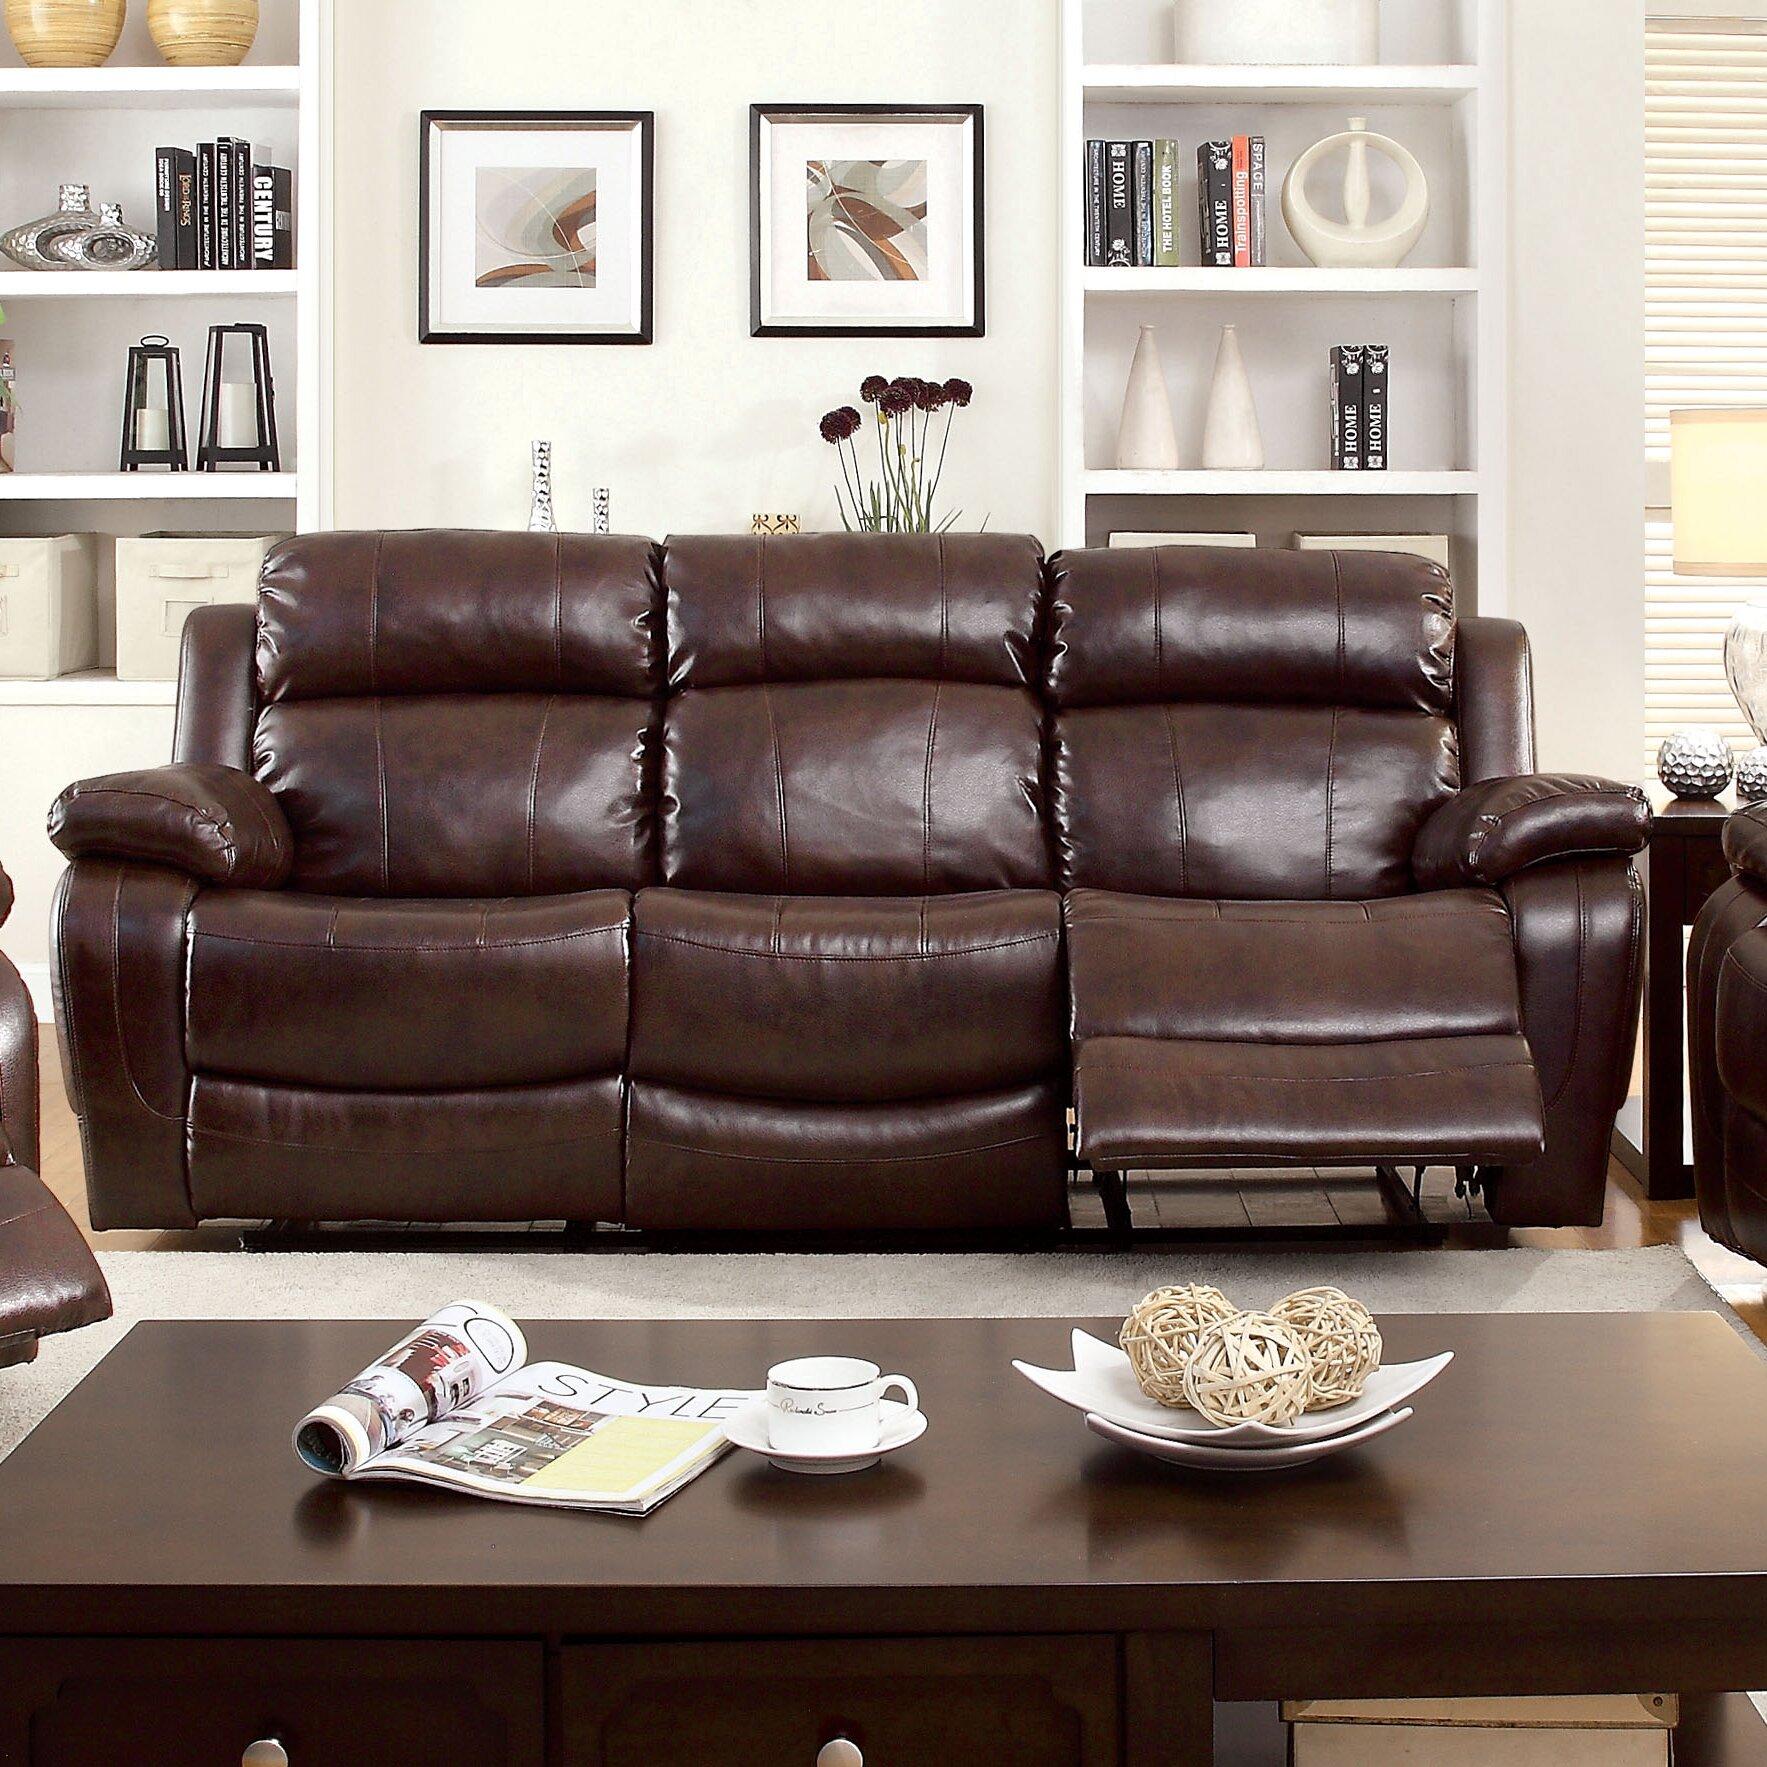 Hokku designs walfred living room collection reviews for Hokku designs living room furniture